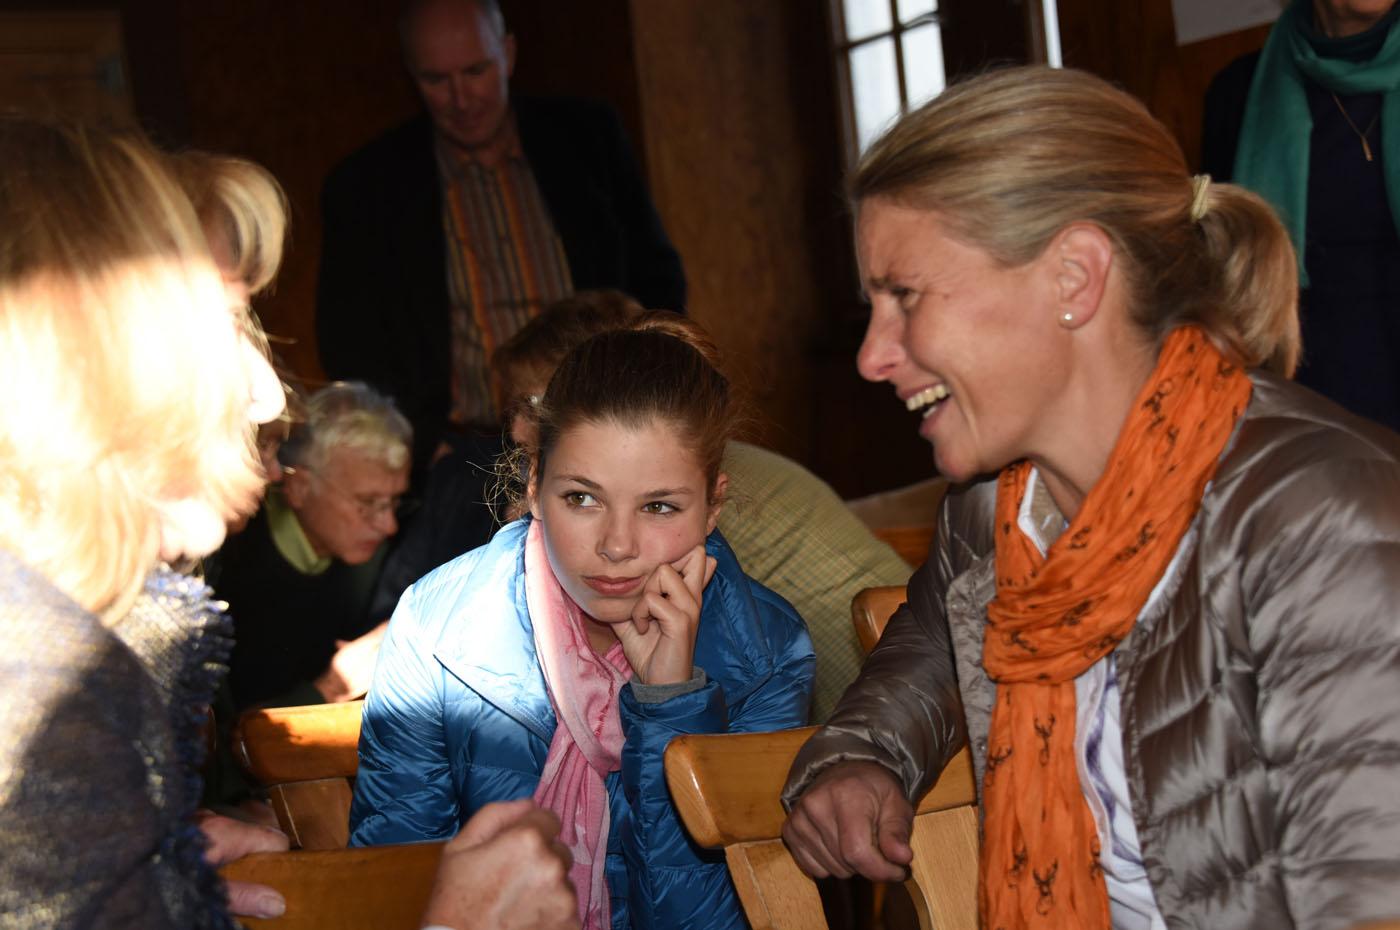 Familientag_23.11.14-Einsiedel_Foto Bückle_026